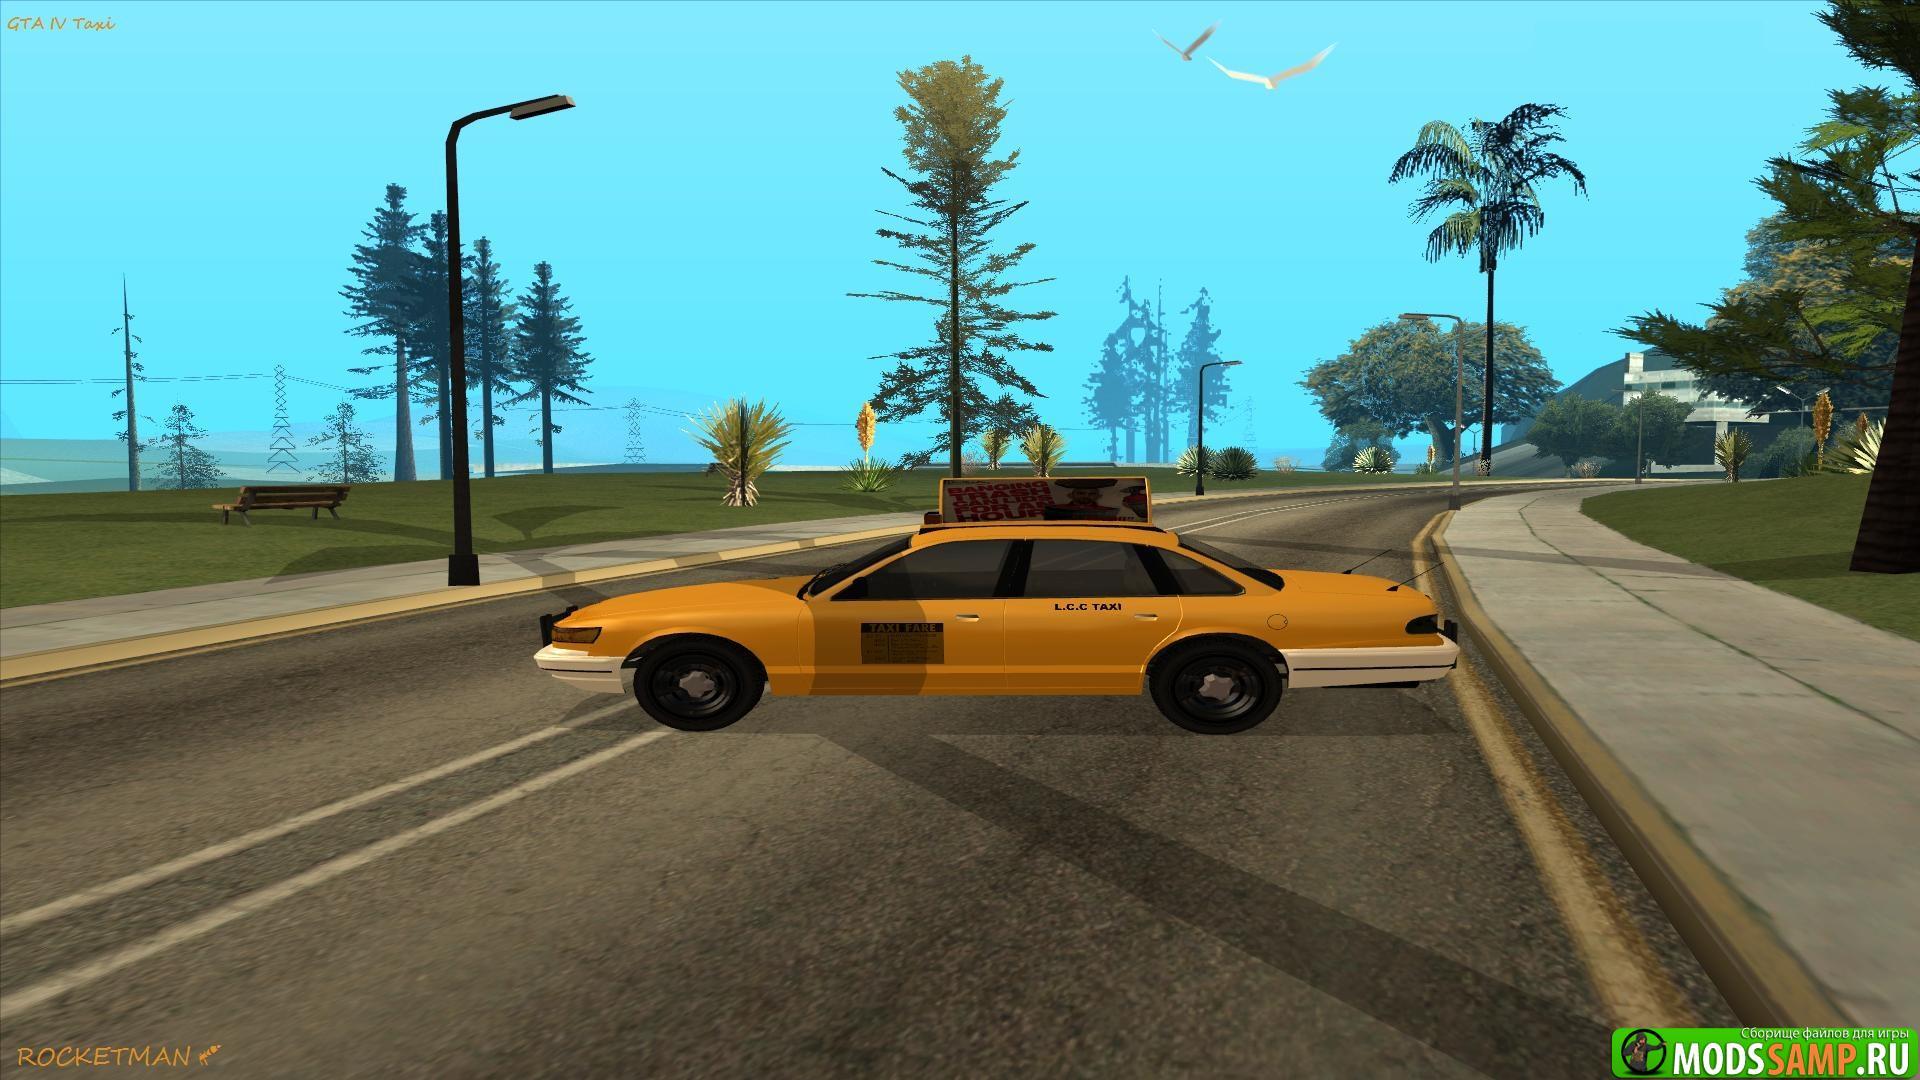 GTA IV Taxi для GTA:SA